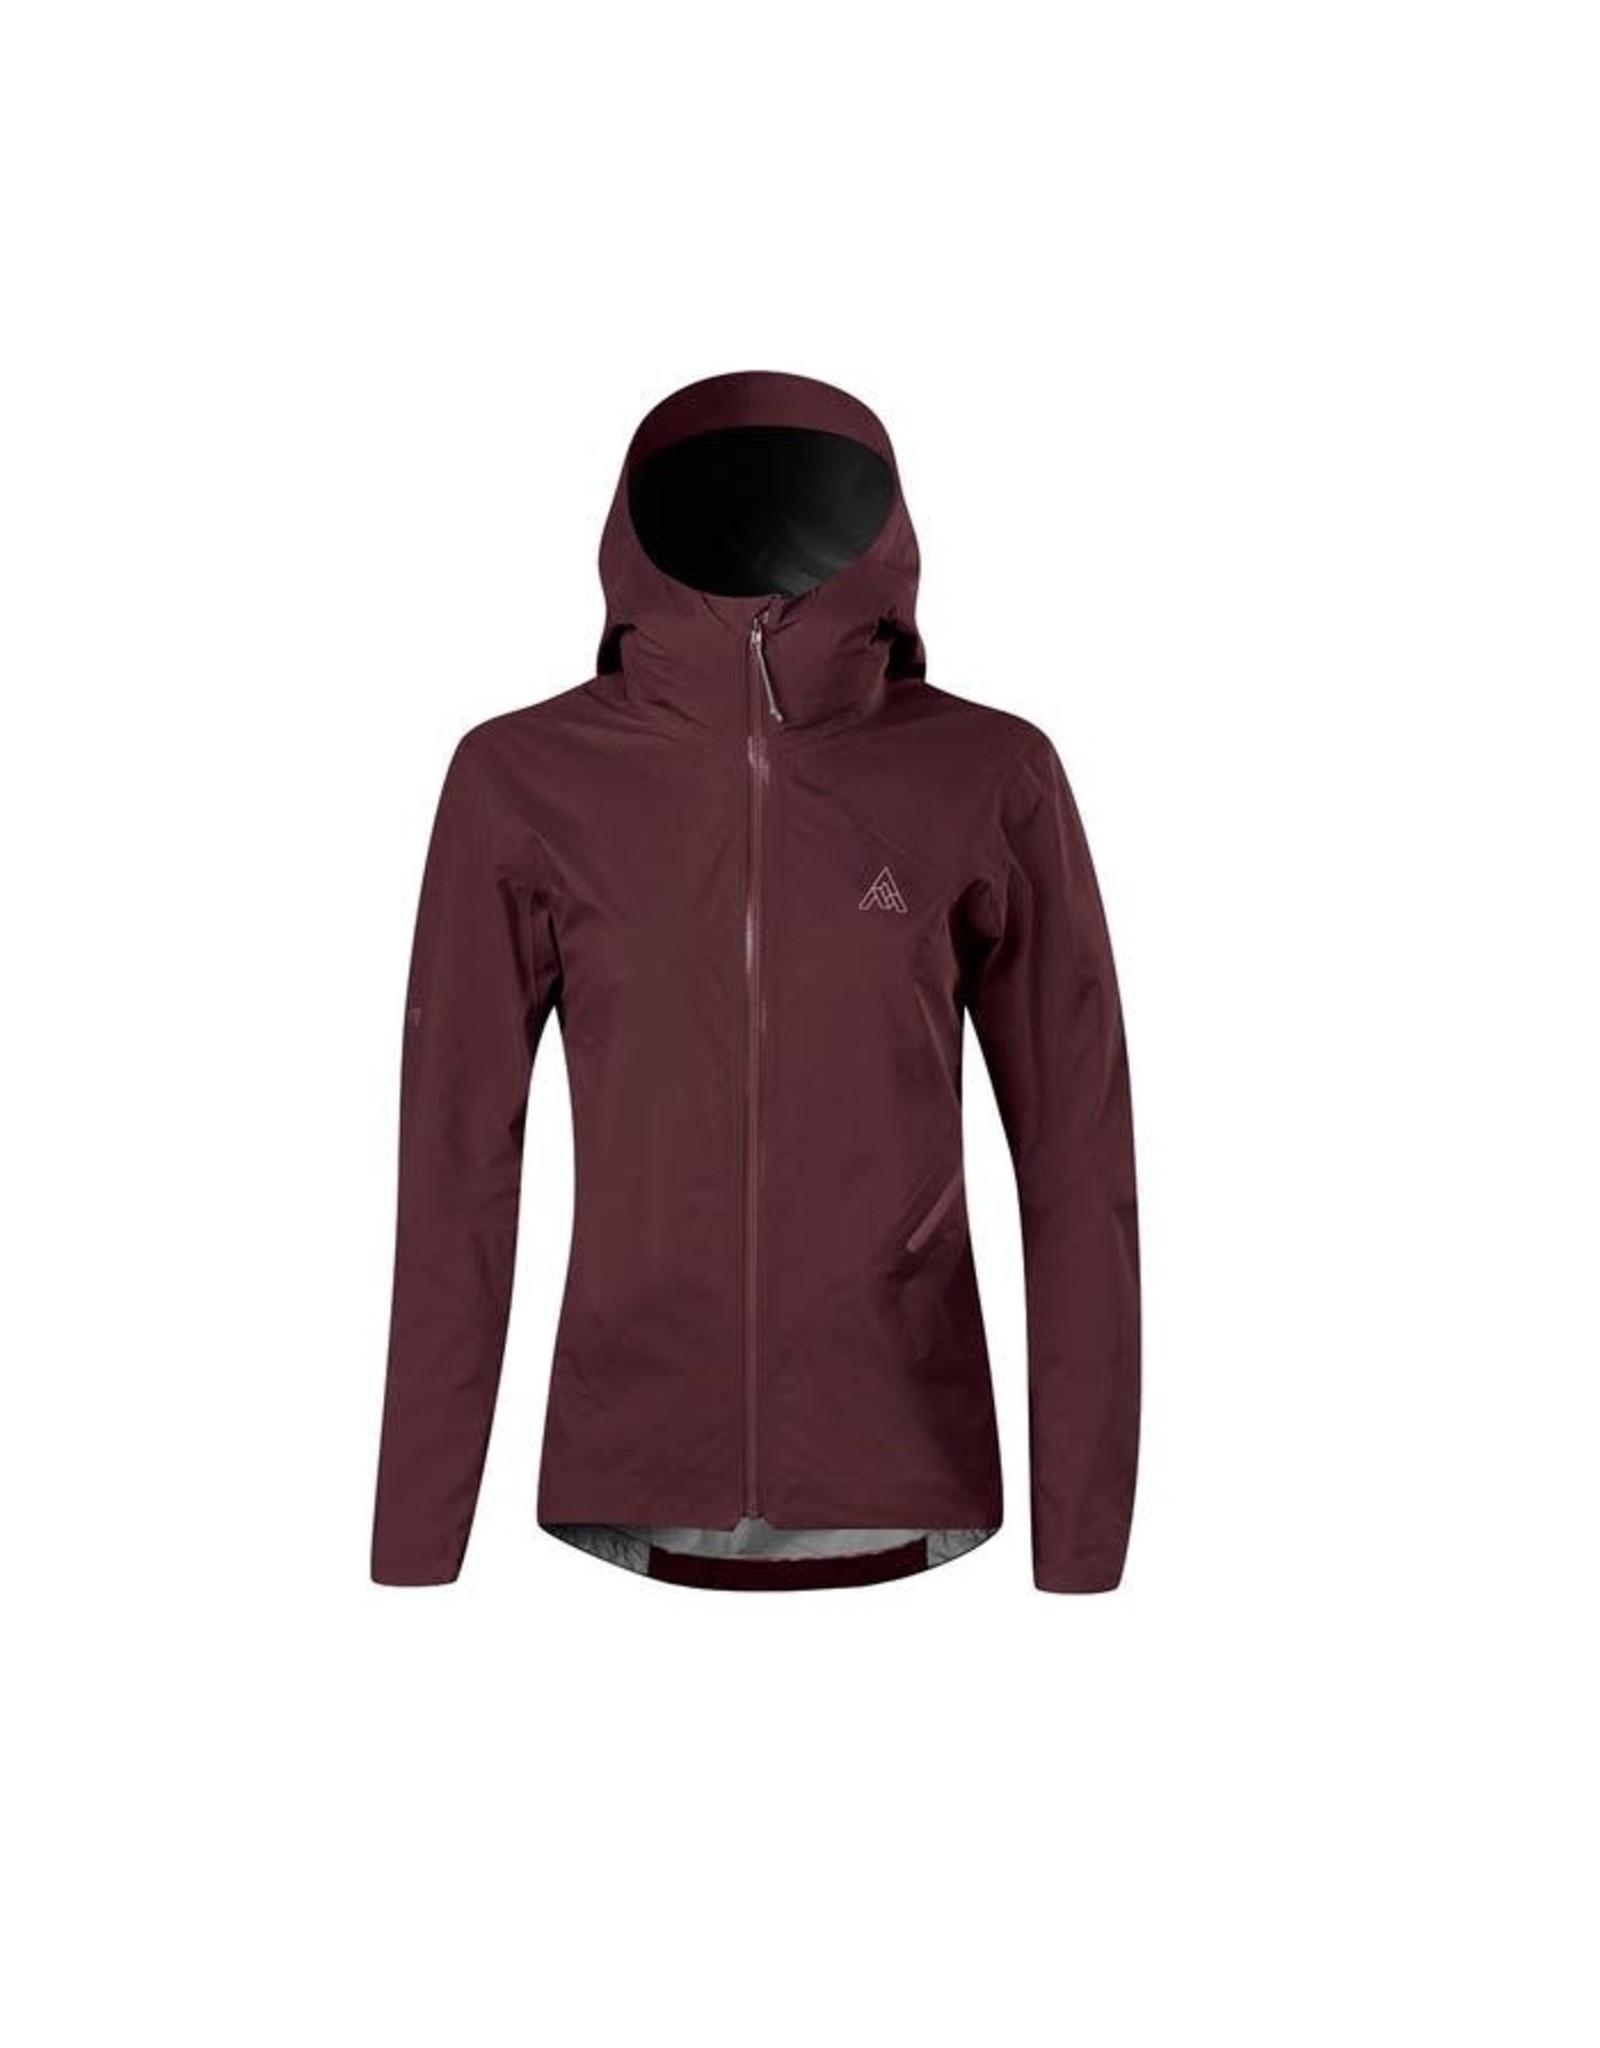 7MESH 7MESH - Copilot Jacket Port Women's XL